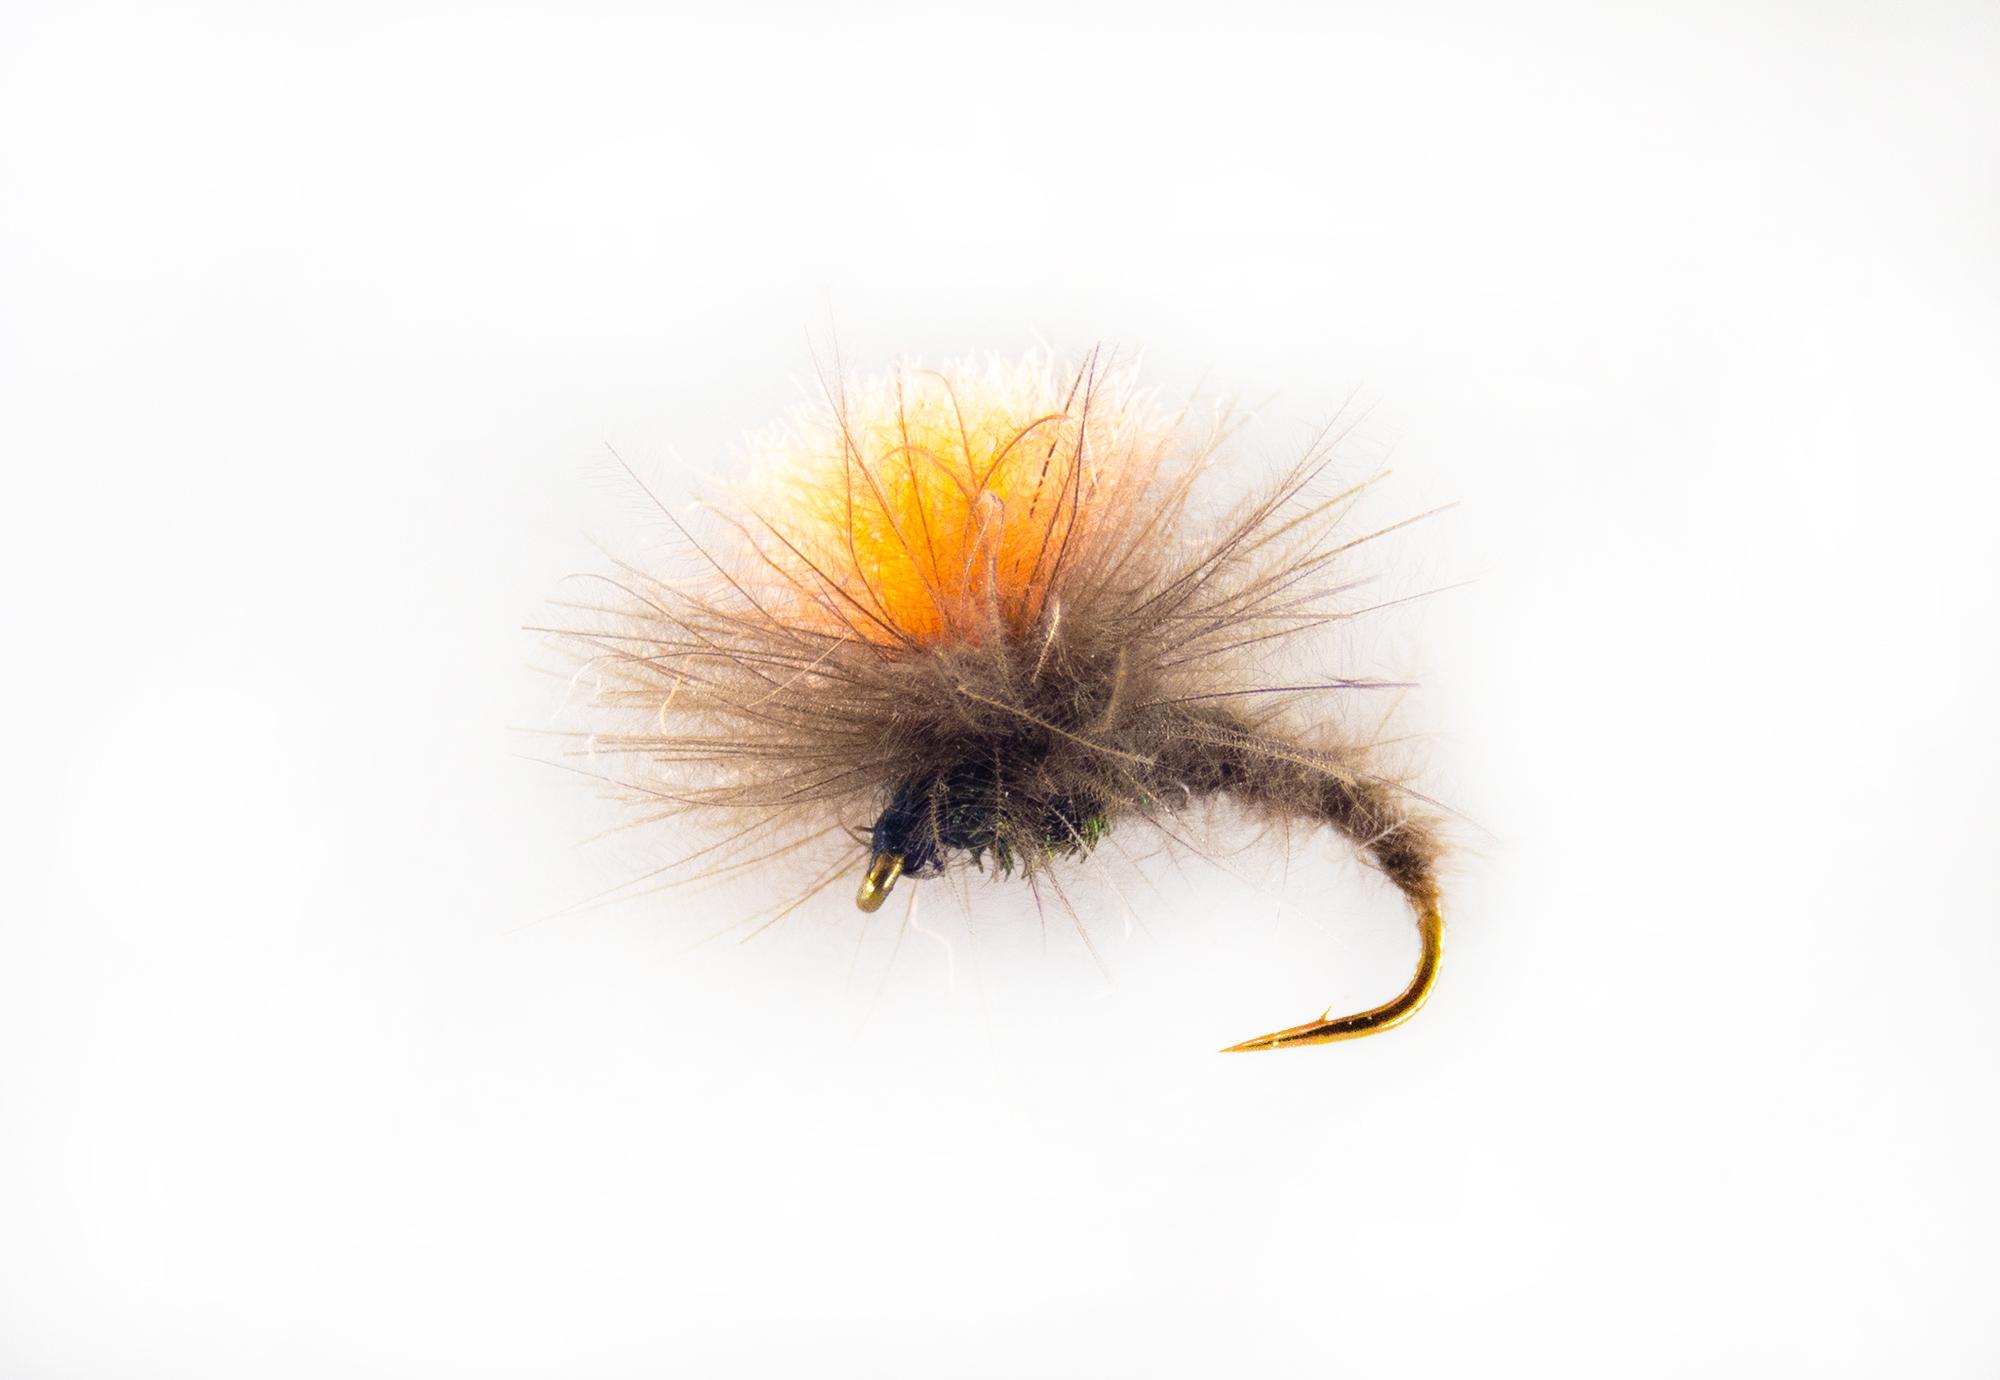 Indicator klinkhammer trout flies